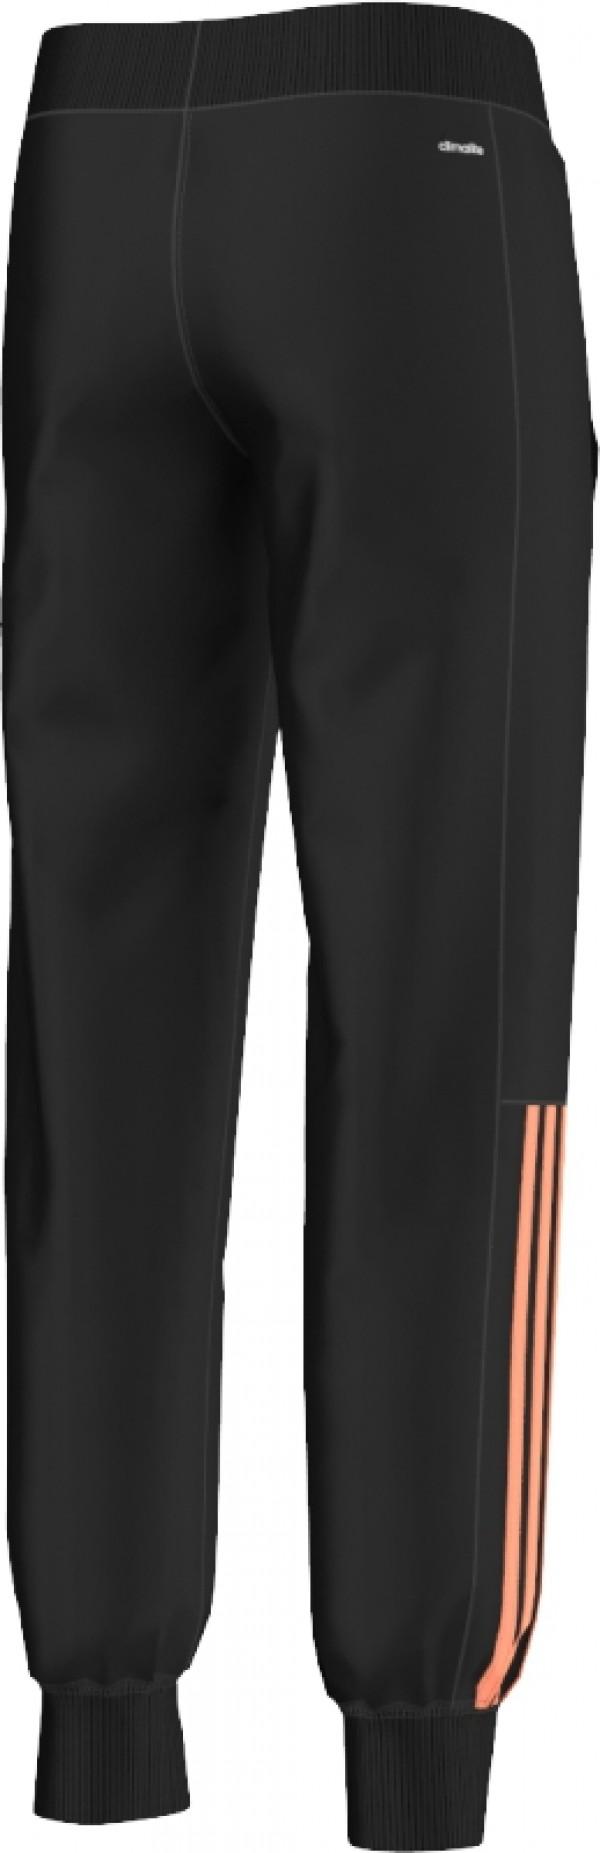 Adidas YG essential pant closed hem